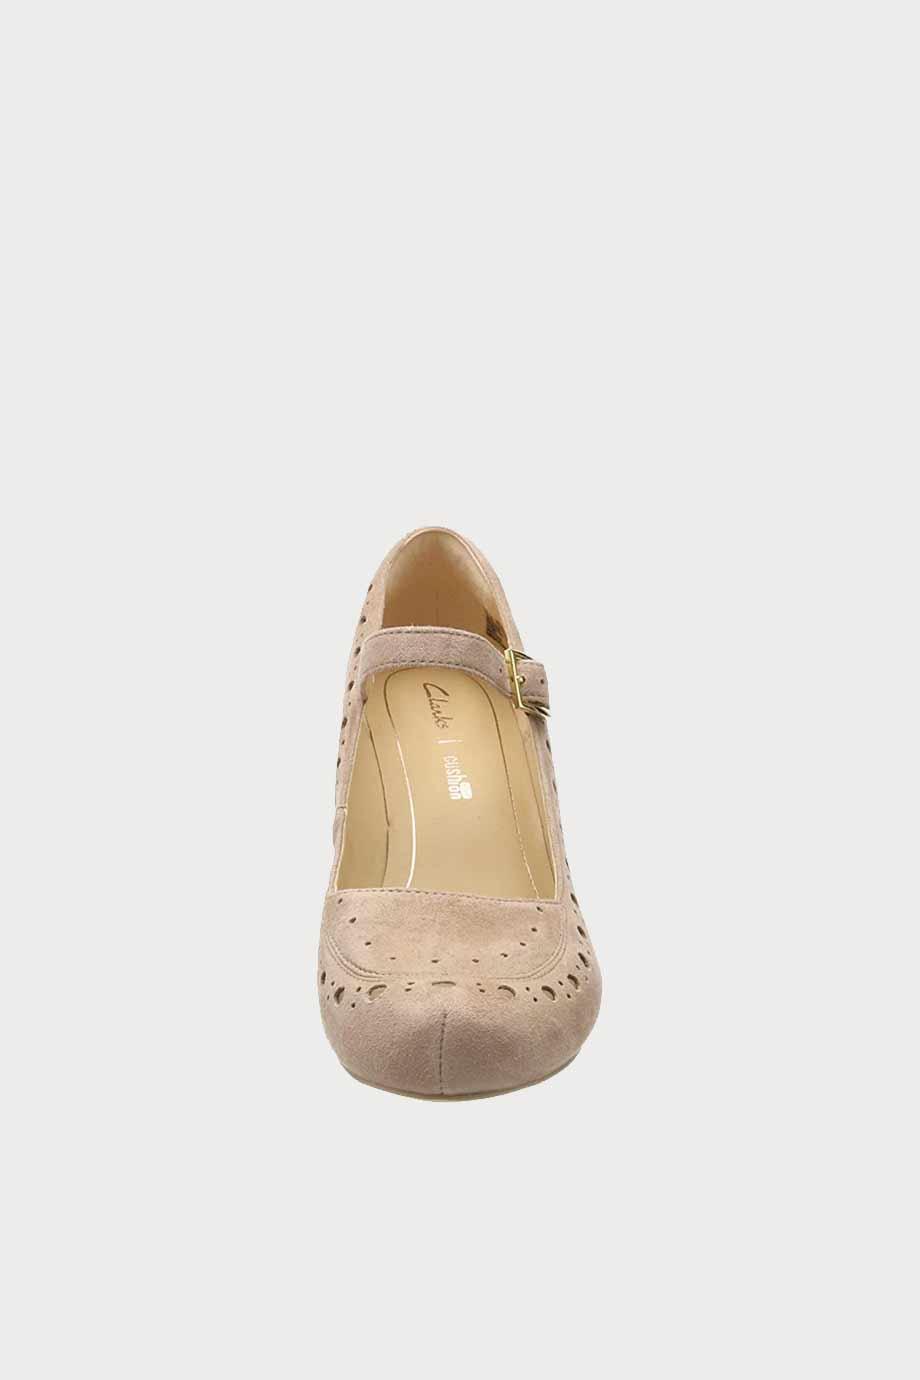 spiridoula metheniti shoes xalkida p Dalia Millie clarks praline leather 2